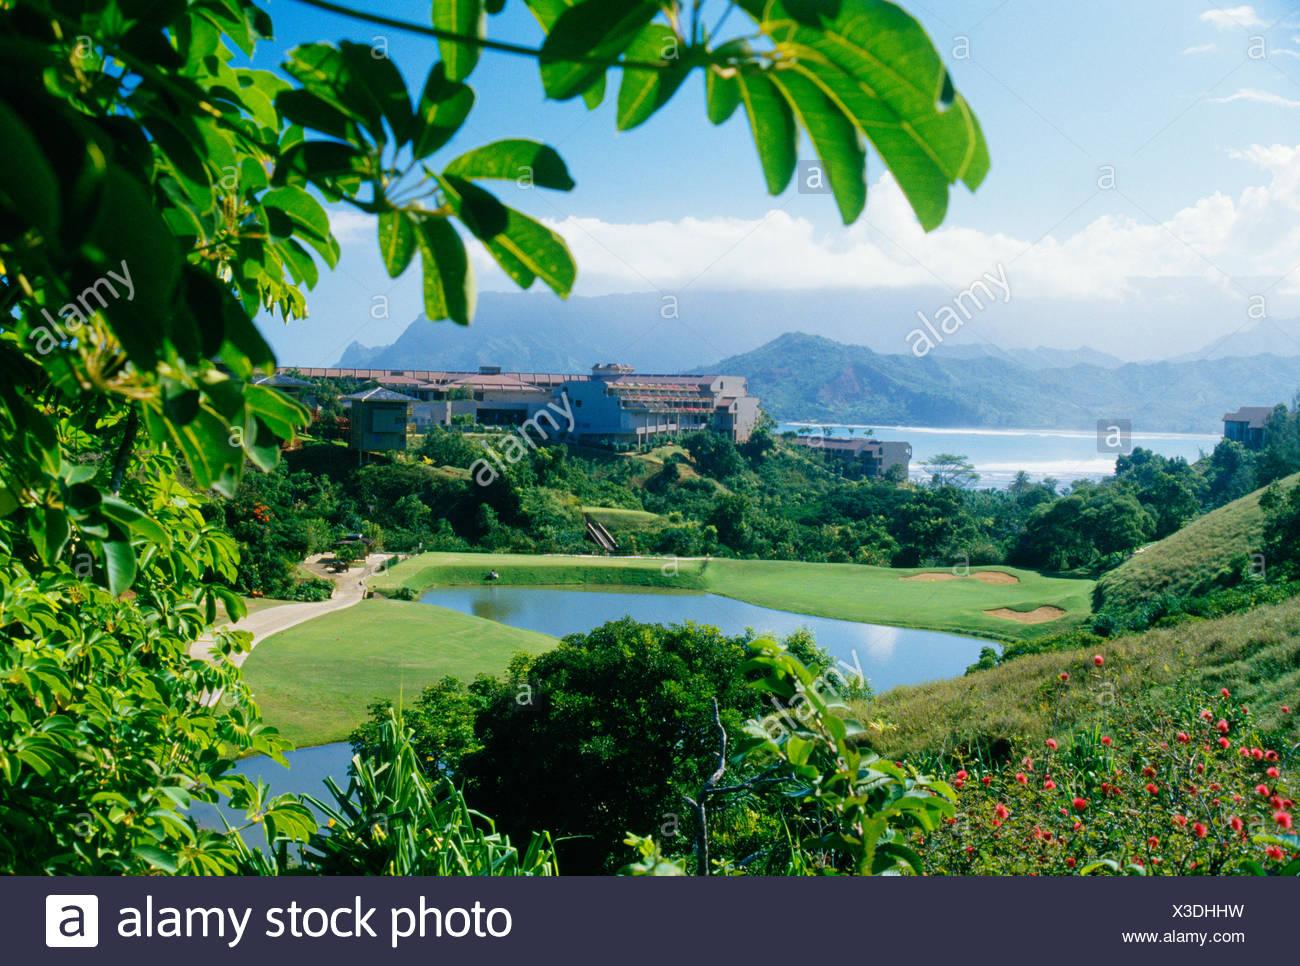 Hawaii Kauai Princeville Sheraton Resort Pond Golf Course 1300x966